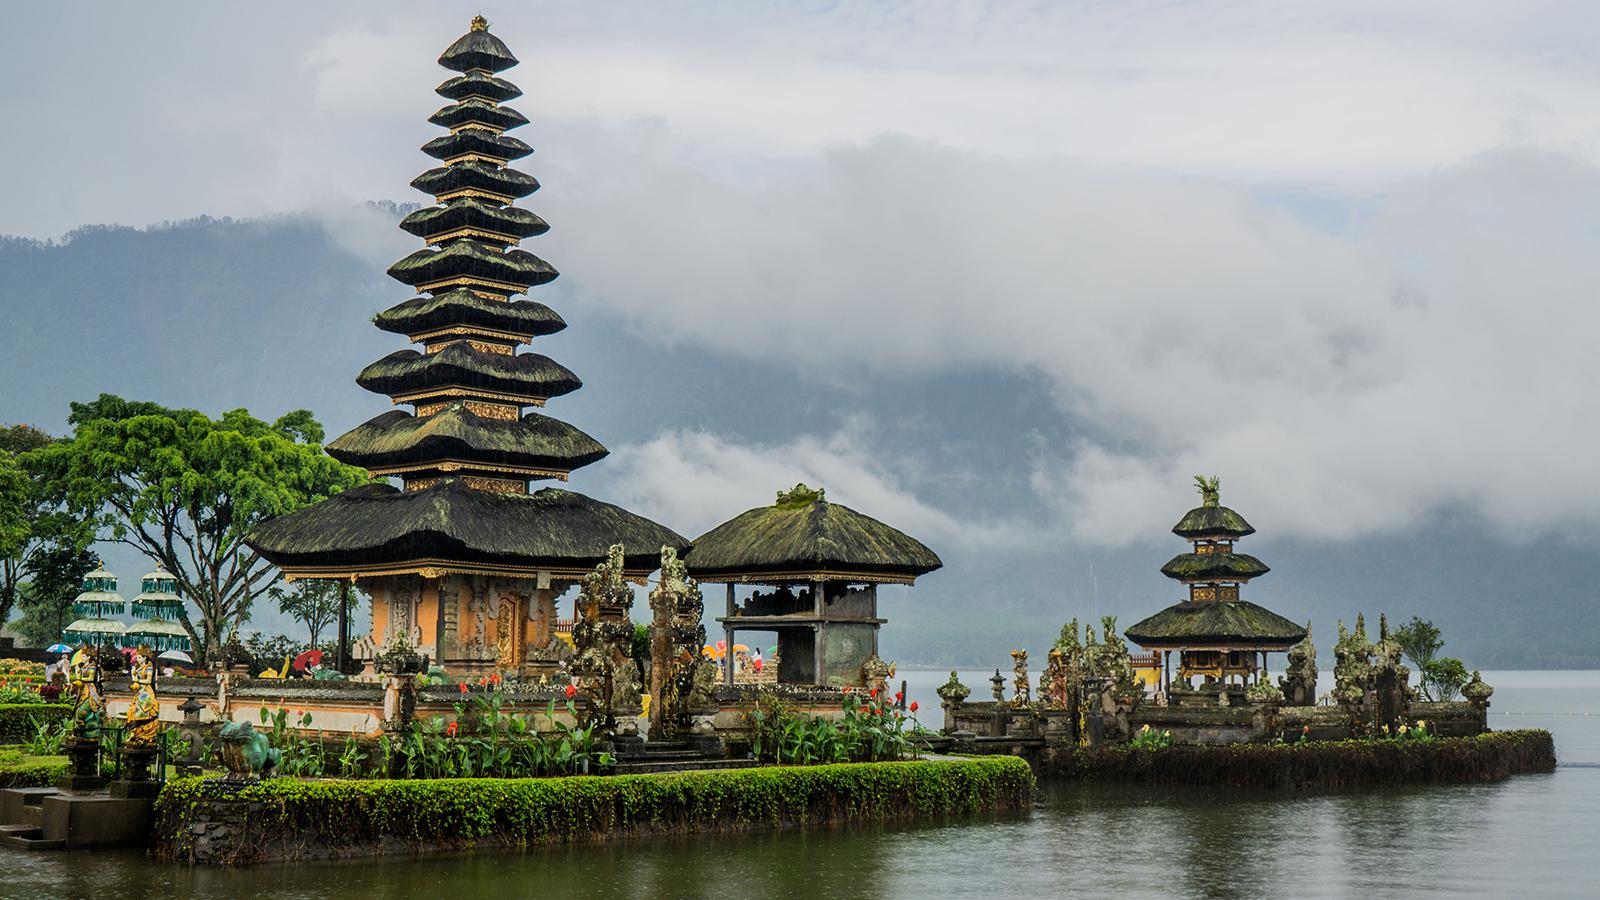 Penyebaran Virus Corona Dikhawatirkan Serang Kinerja Sektor Pariwisata Indonesia